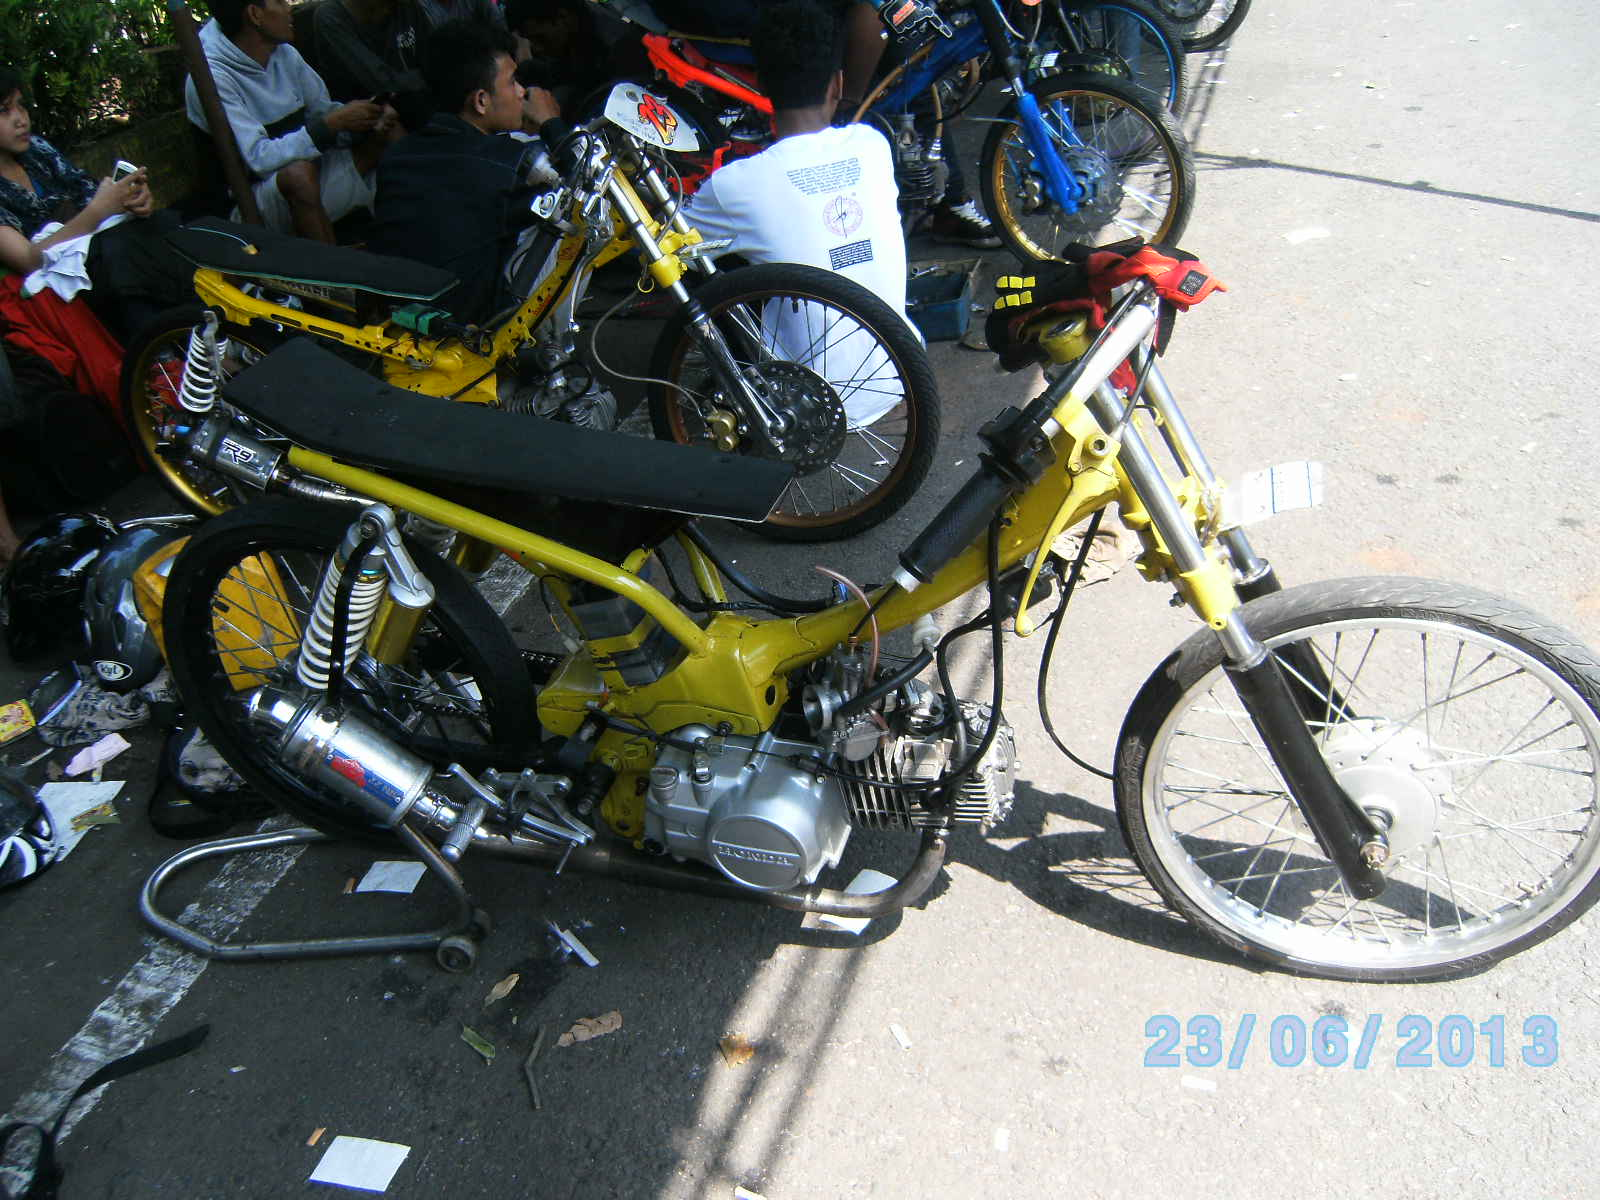 video dragbike balap liar | honda motorcycles trend mode motorbike